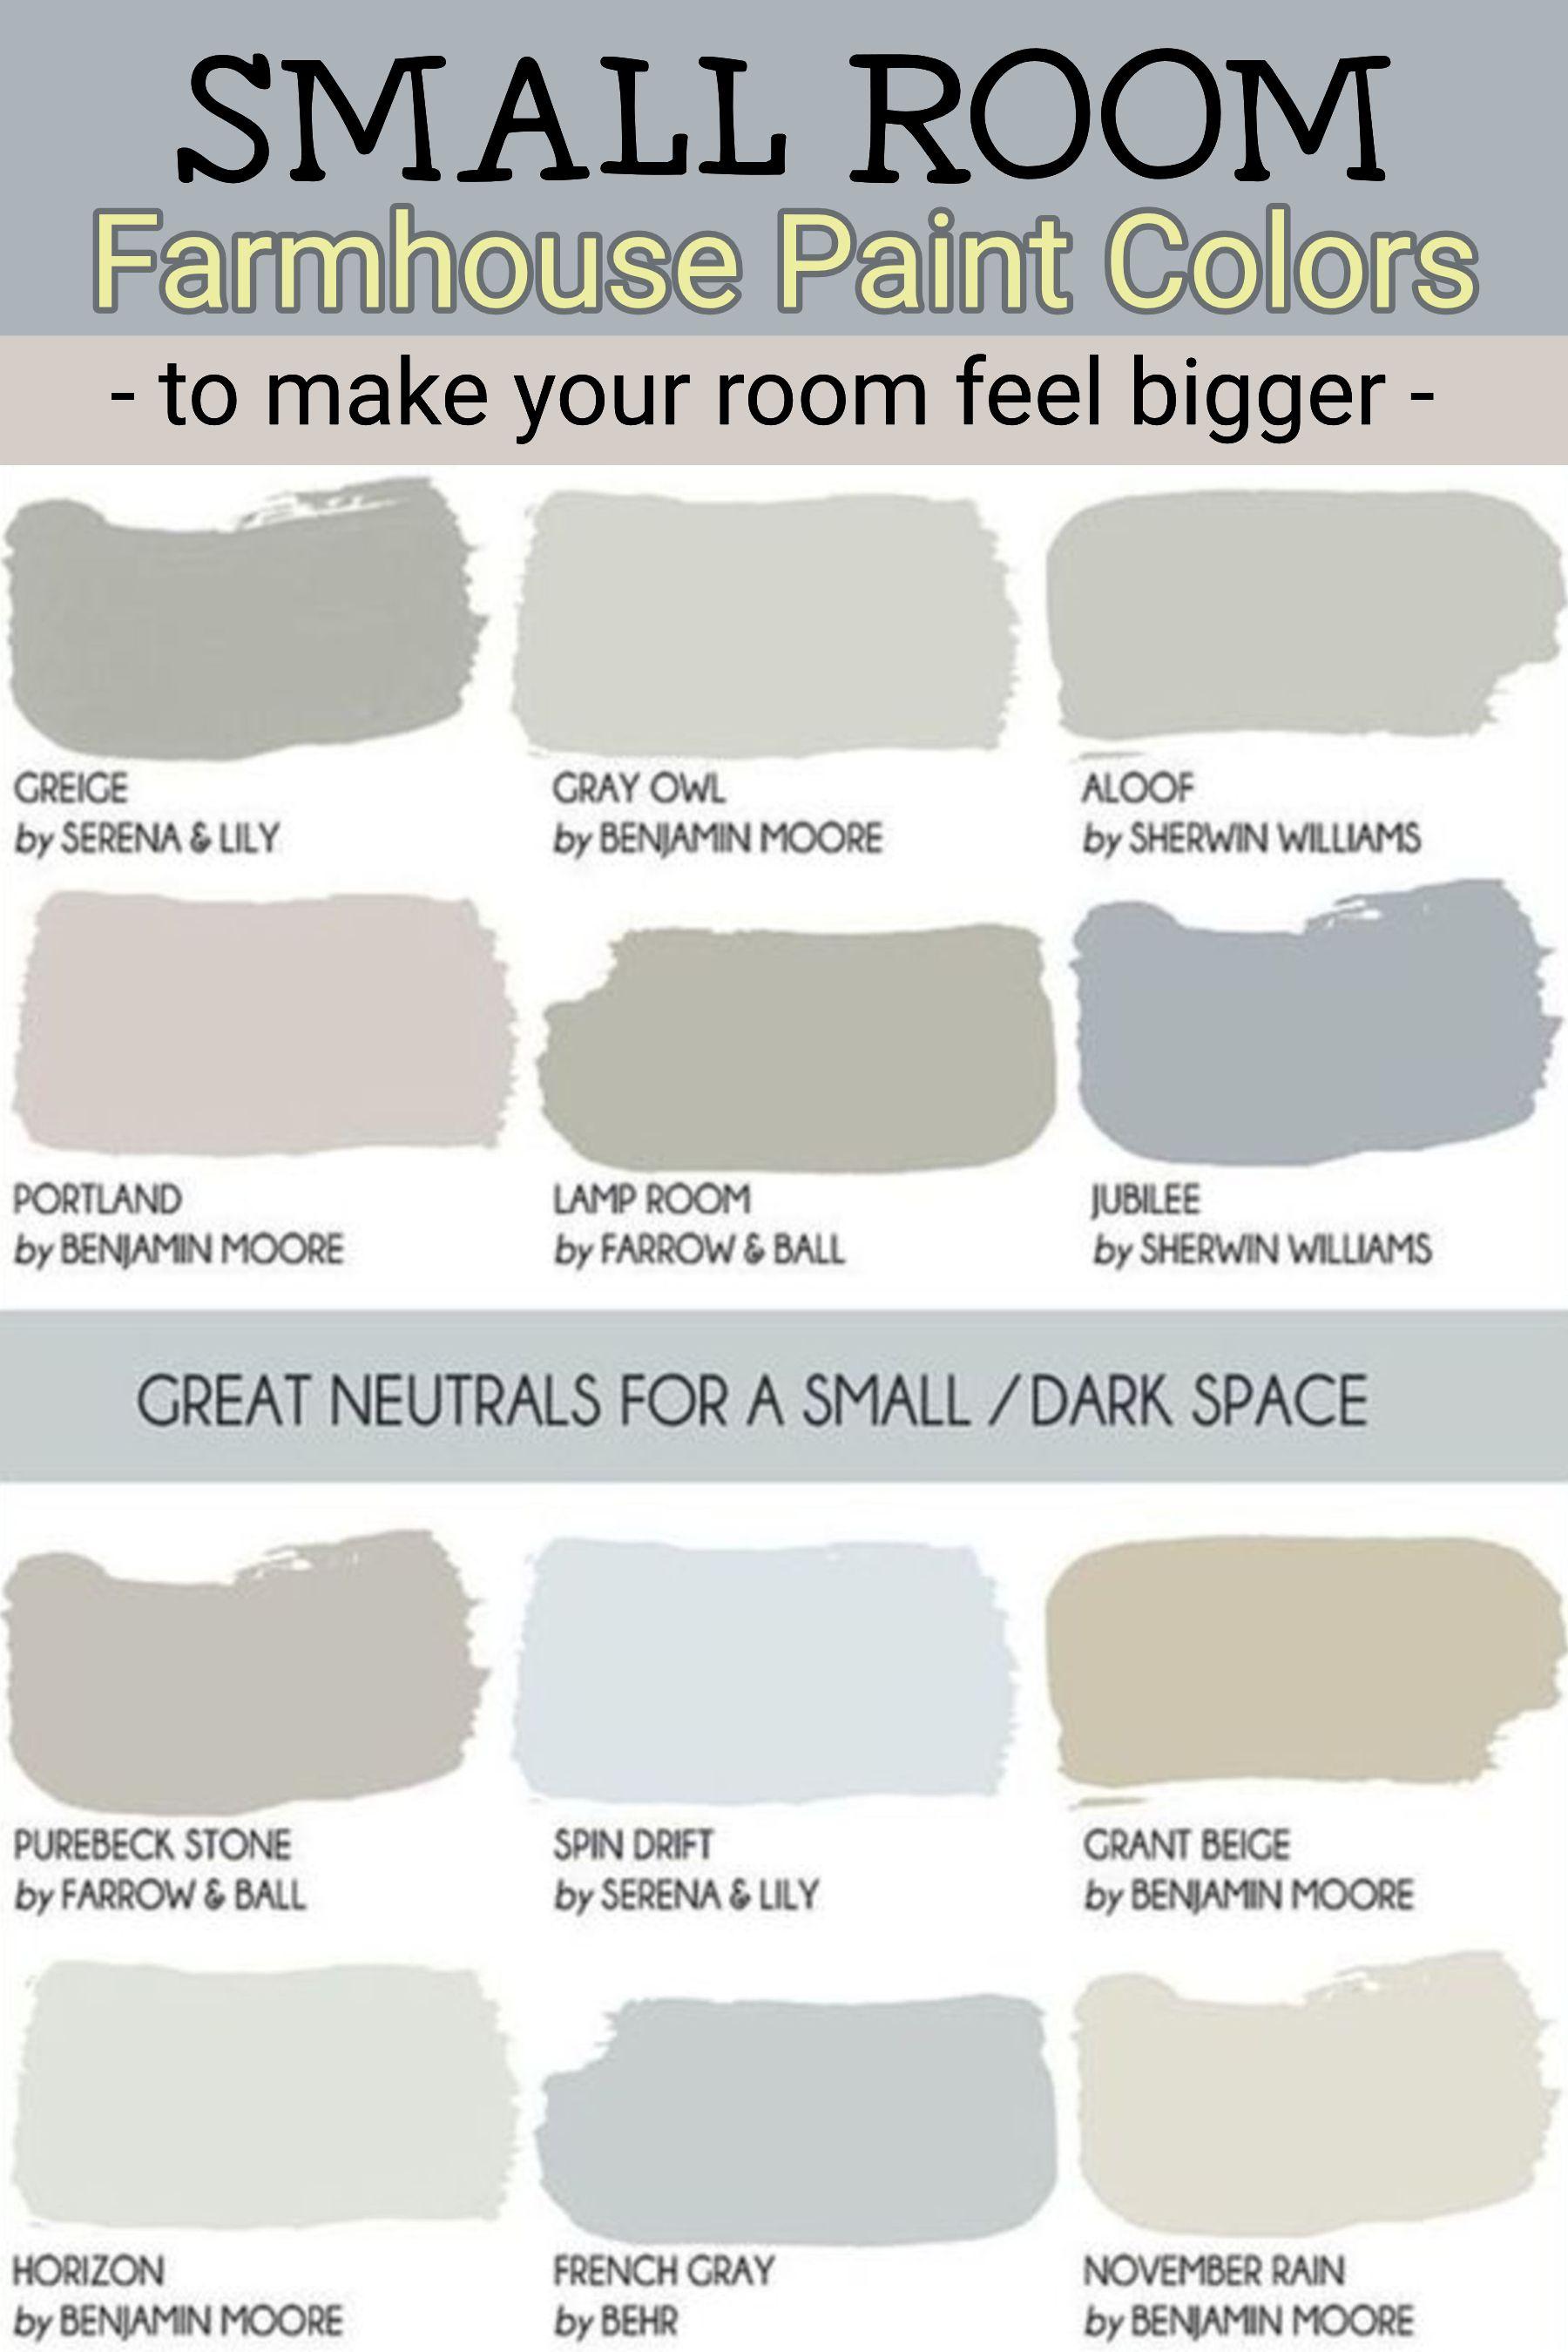 Cozy Neutral Living Room Ideas Earthy Gray Living Rooms To Copy In 2020 Neutral Living Room Neutral Living Room Paint Color Neutral Living Room Paint